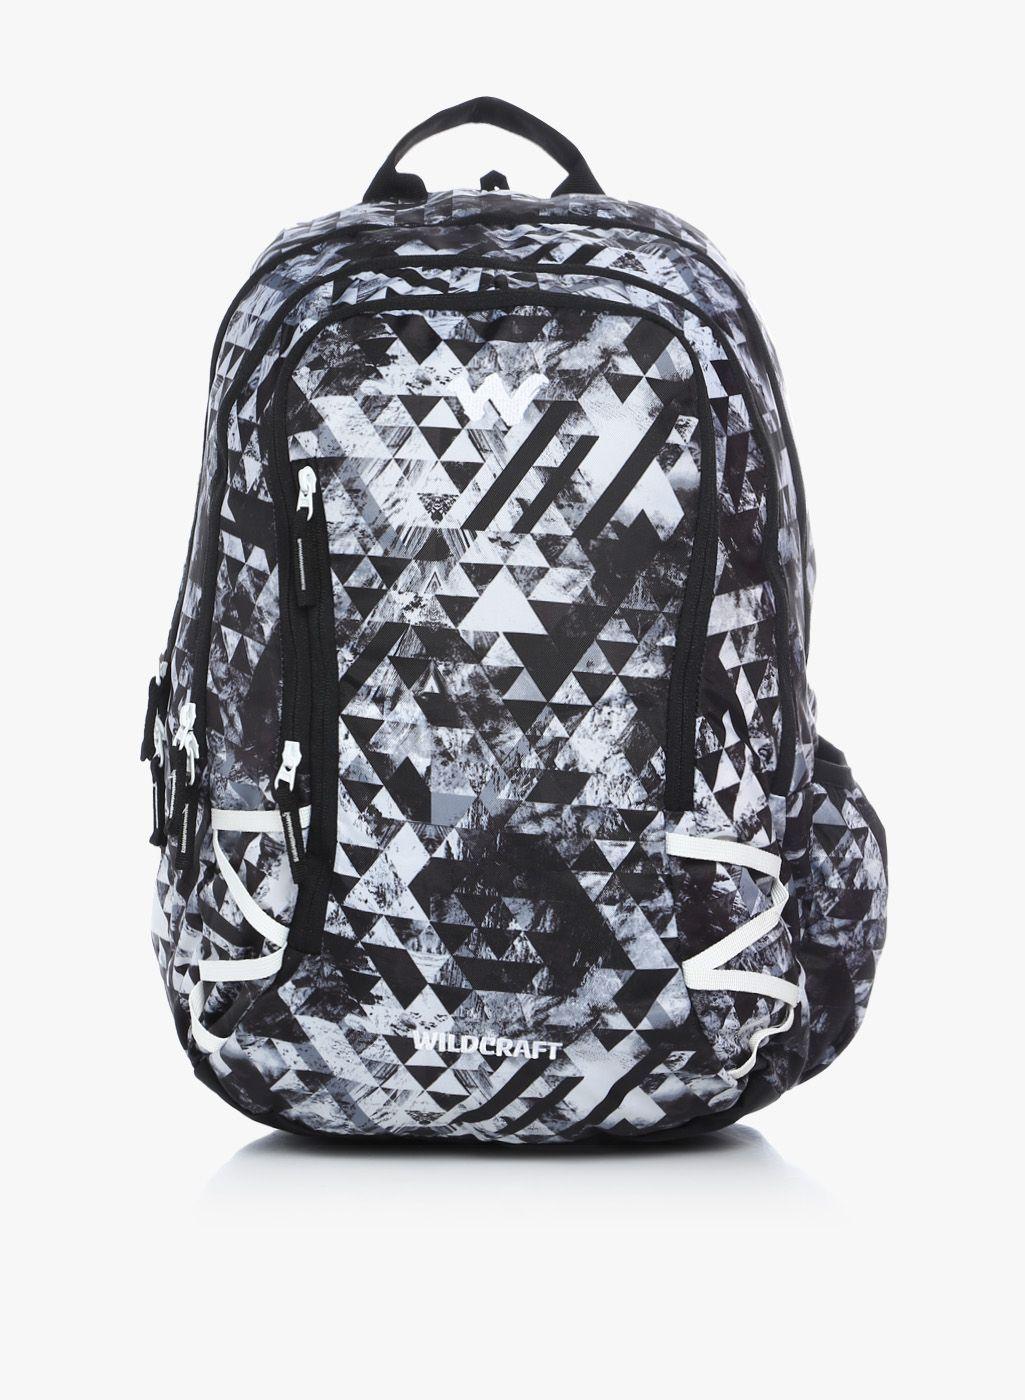 9fd1923fe977 Buy Wildcraft Black Backpack for Men Online India